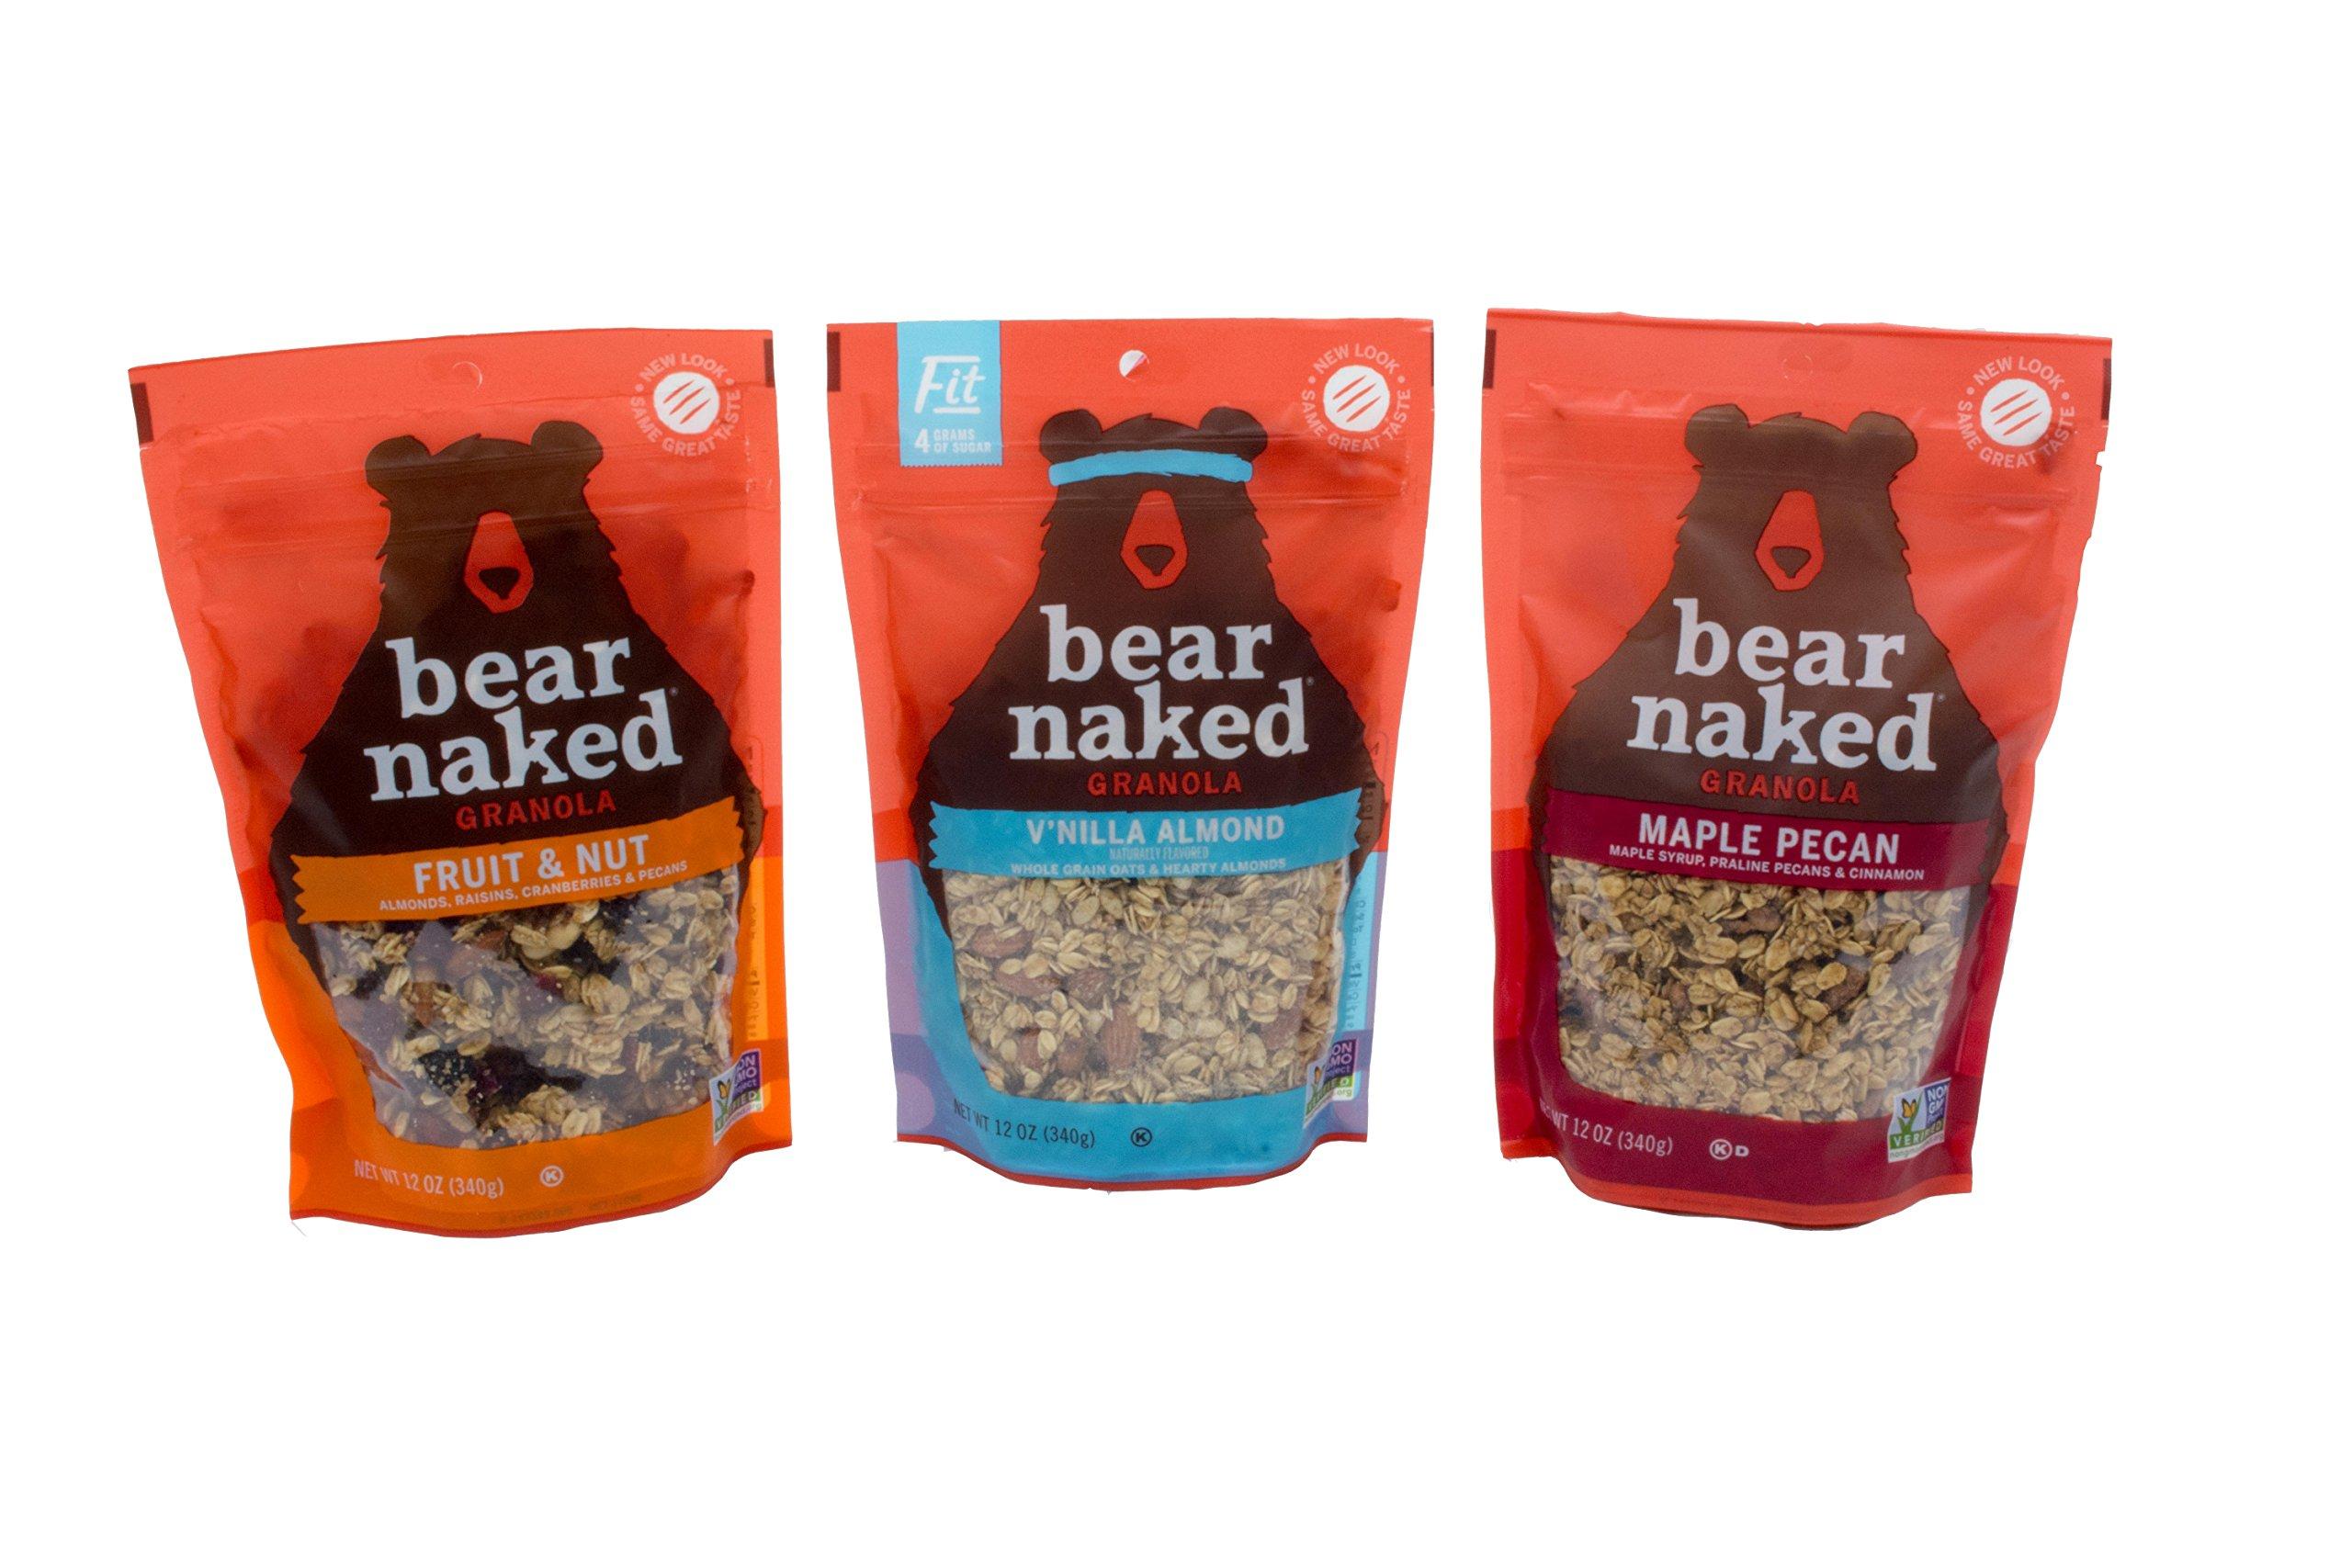 Bear Naked 100% Natural Granola 3 Flavor Variety Pack: (1) Bear Naked Maple-icious Pecan Granola, (1) Bear Naked V'nilla Almond Fit Granola, and (1) Bear Naked Fruit And Nutty Granola, 12 Oz. Ea.